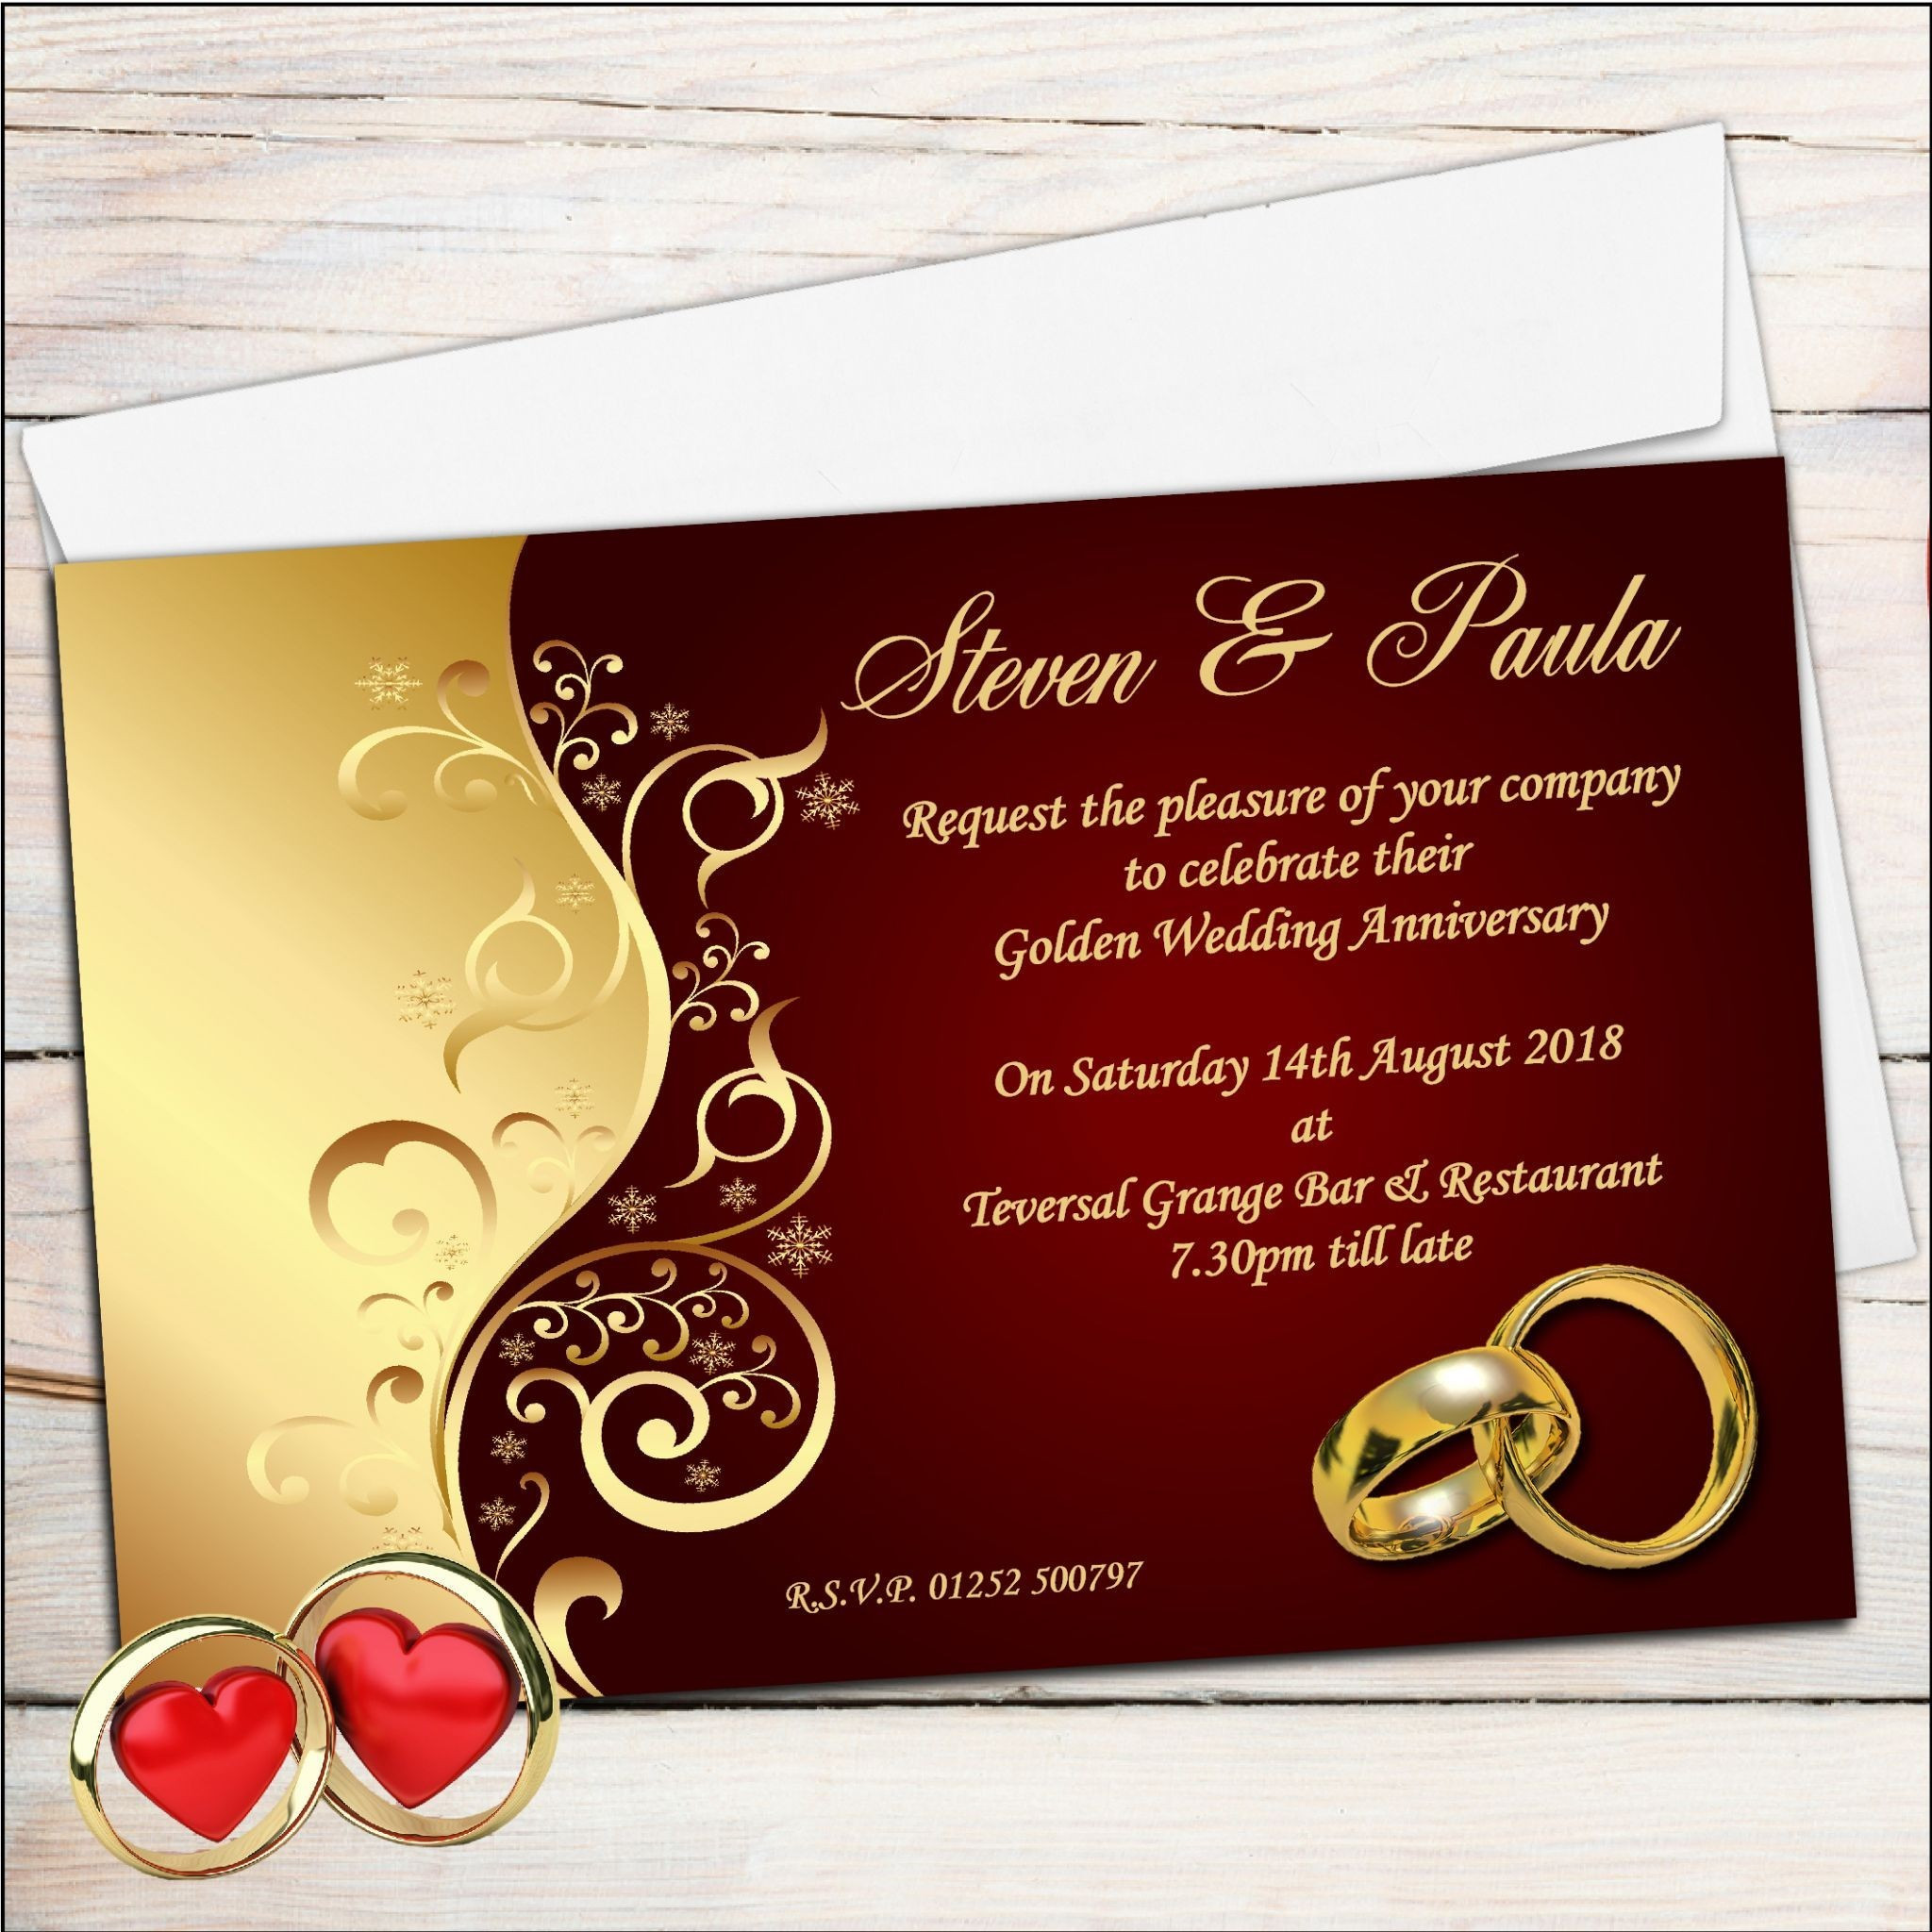 Do design invitation cards by Aakarshanie